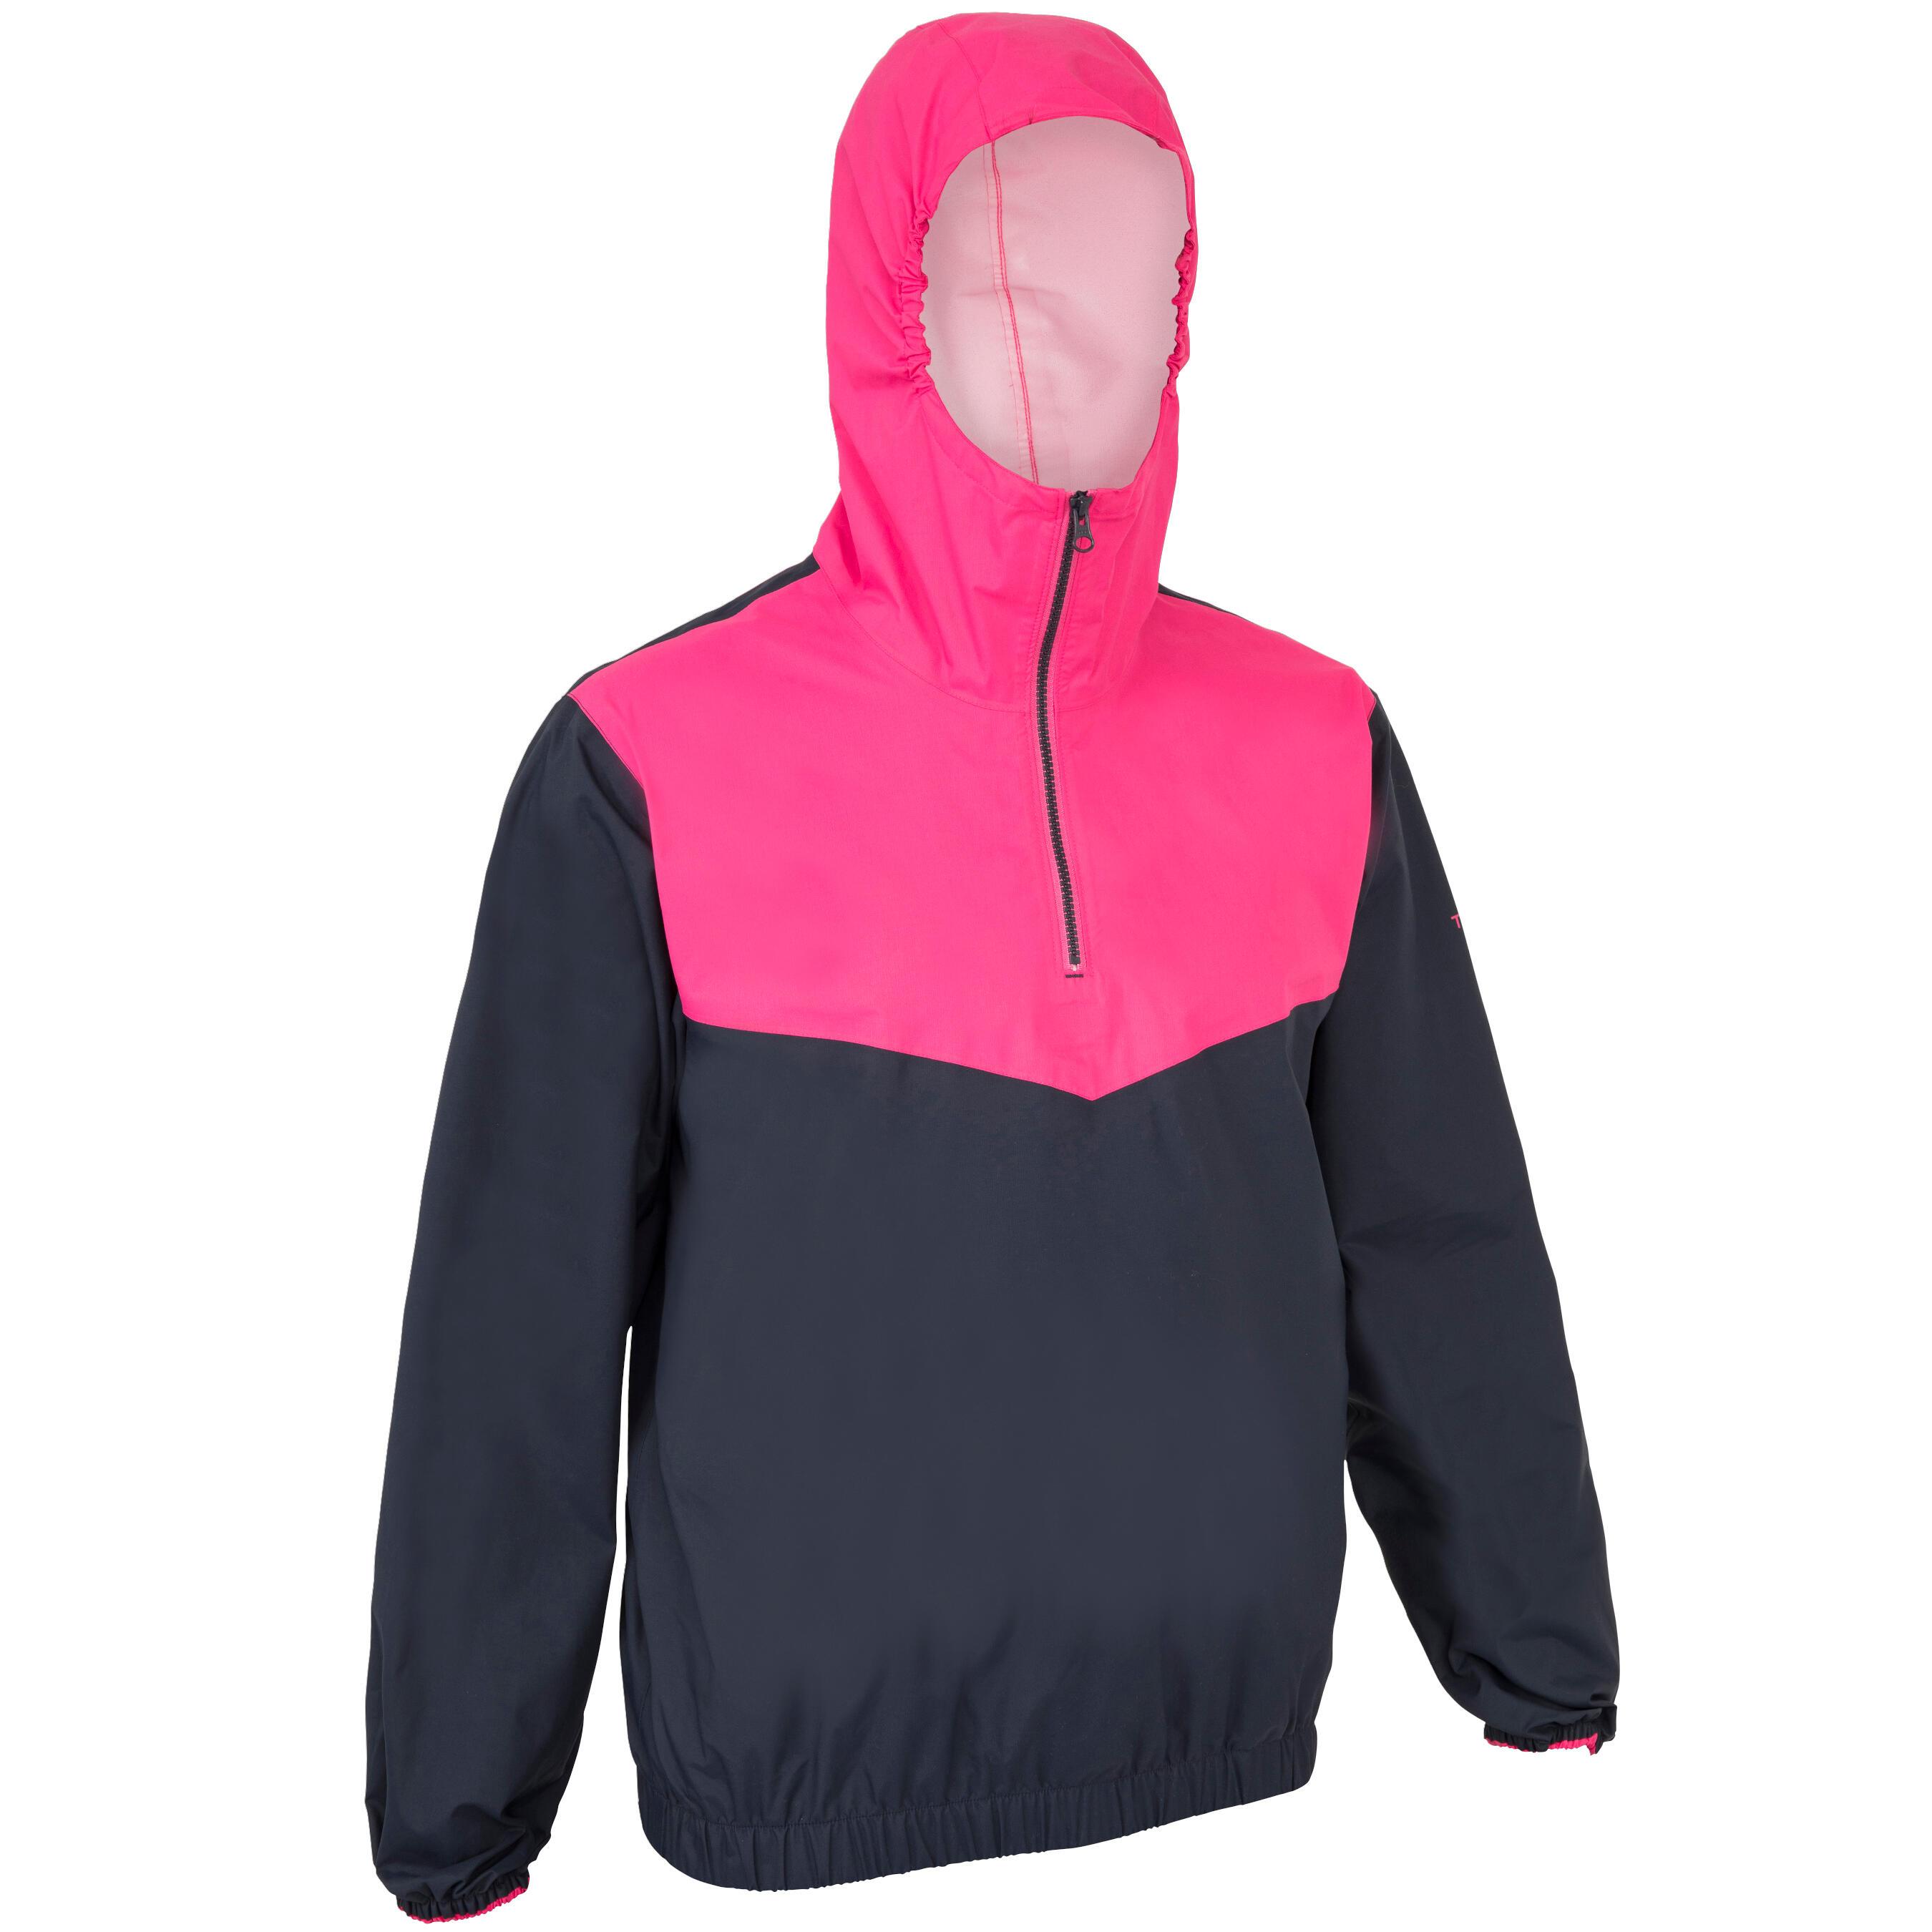 Jachetă Protecție Vânt 100 imagine produs